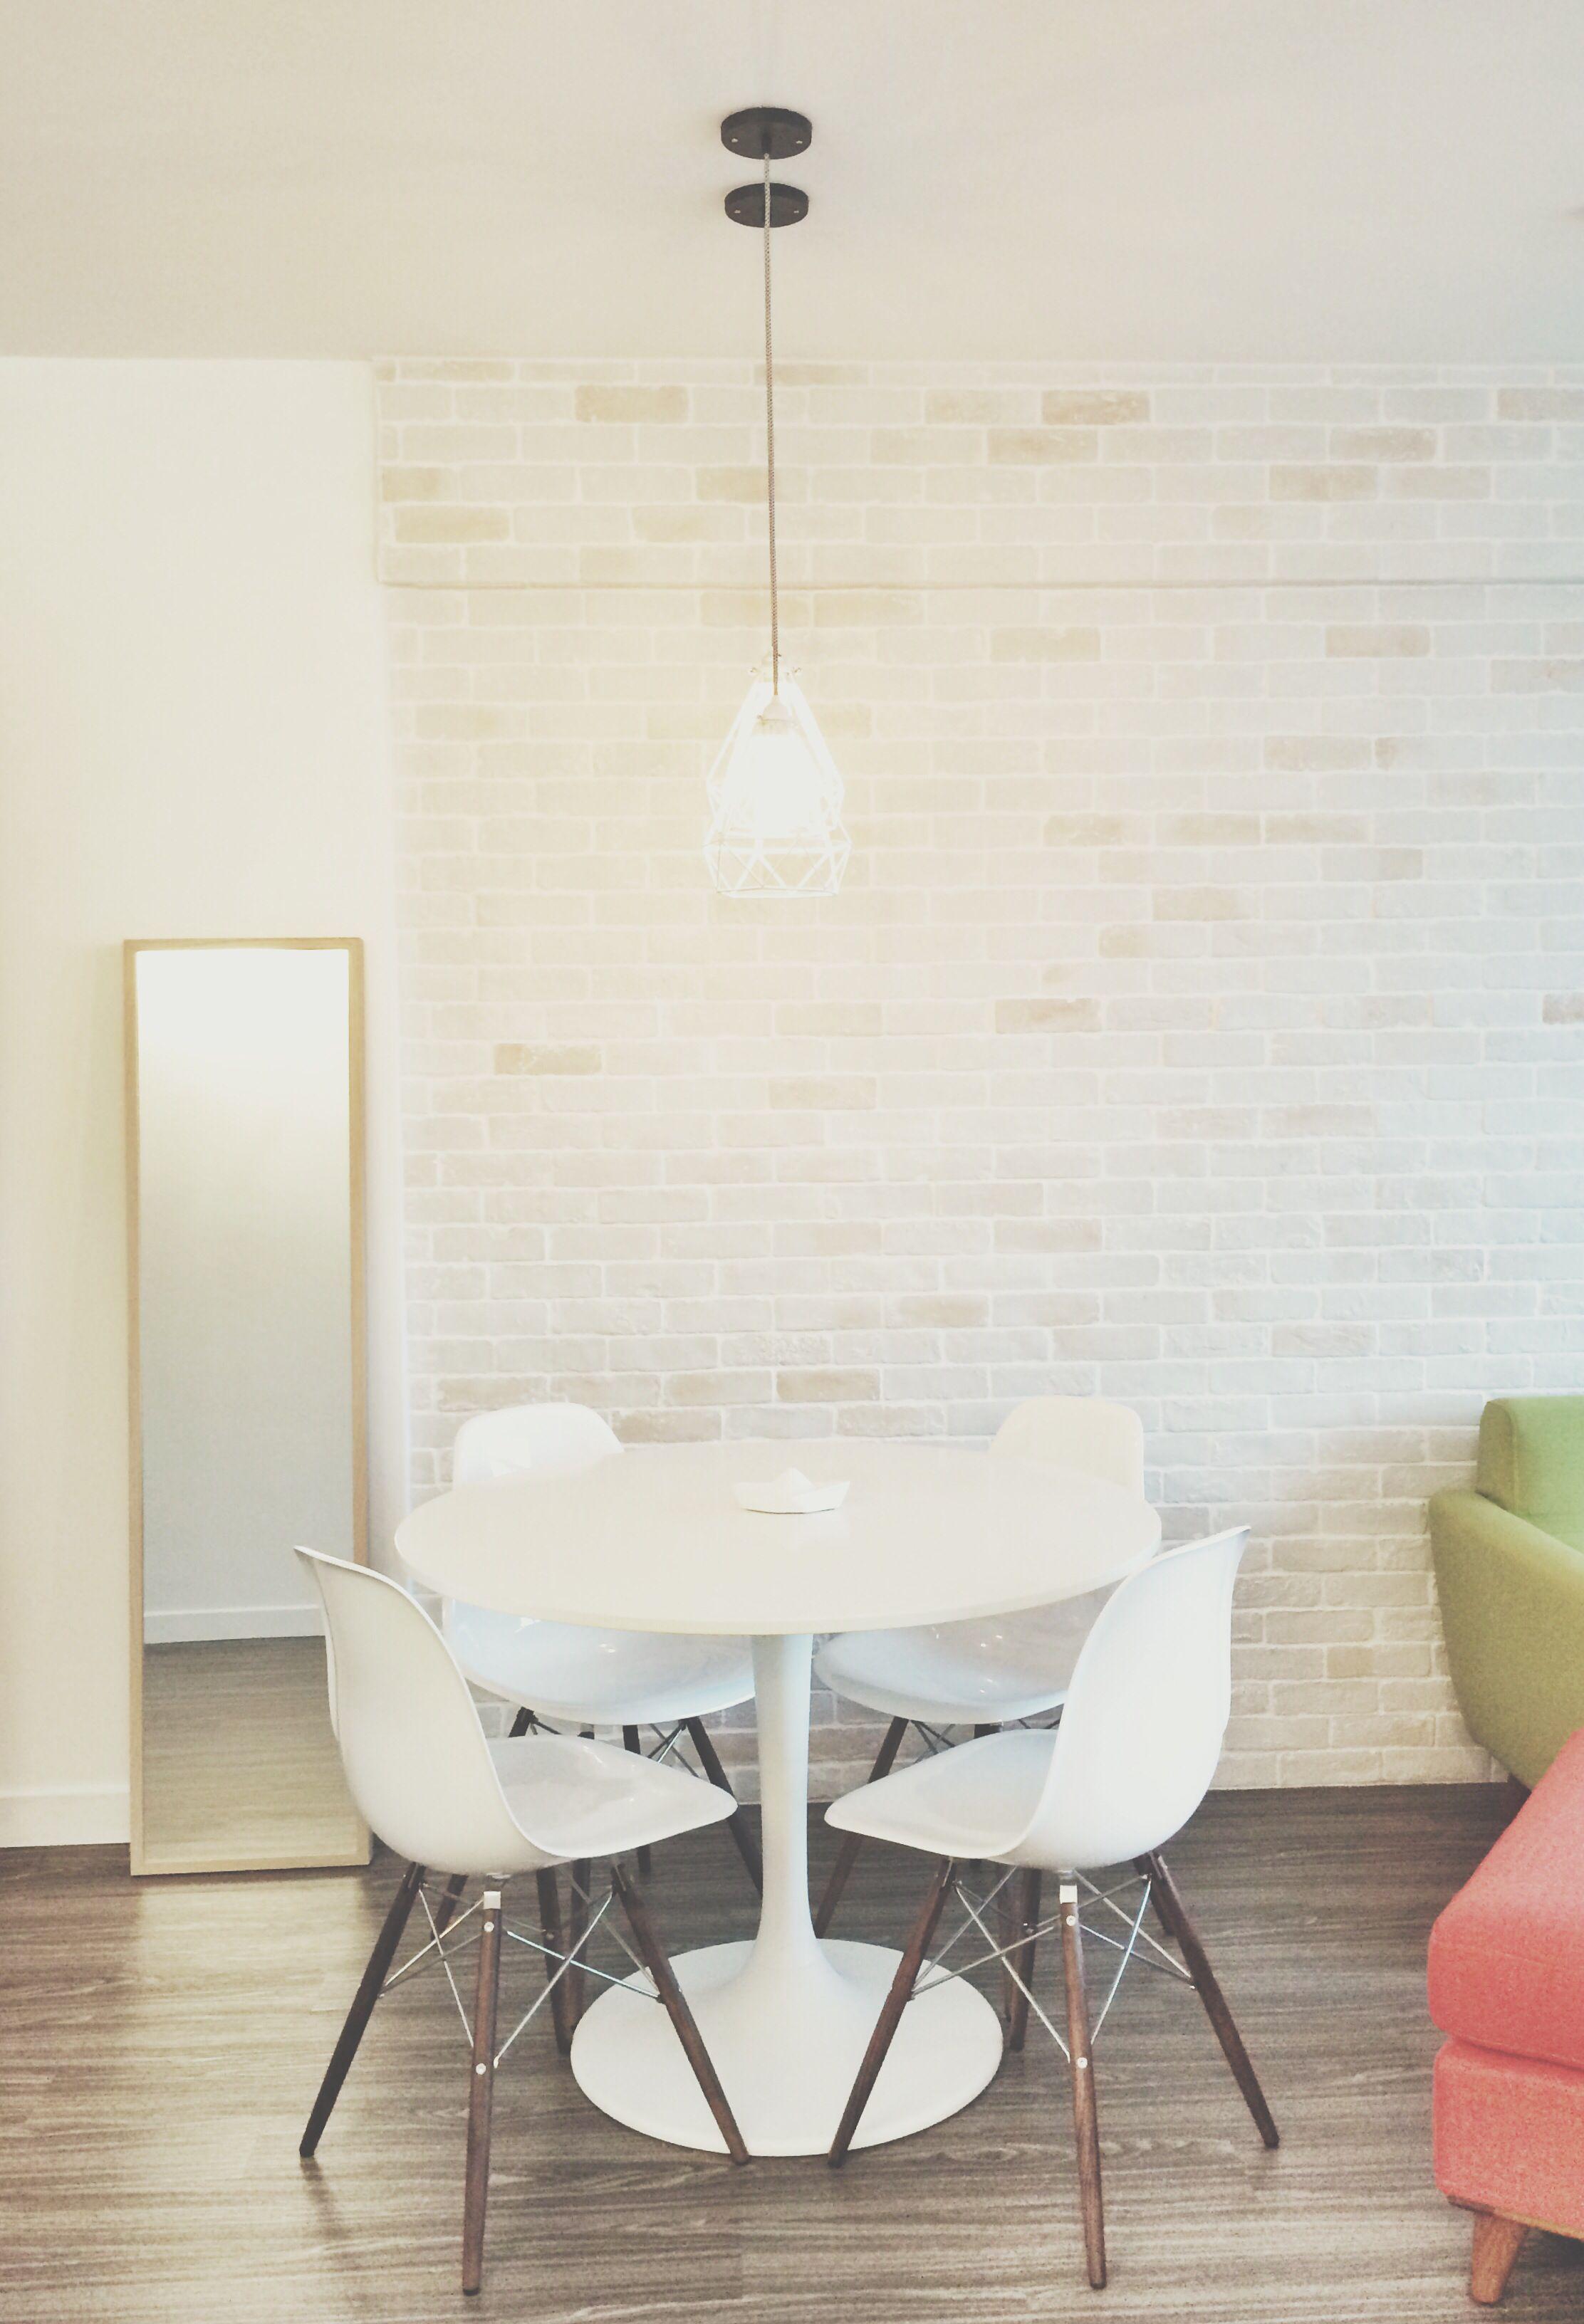 Ikea christmas | Ikea dining room, Ikea dining chair ...